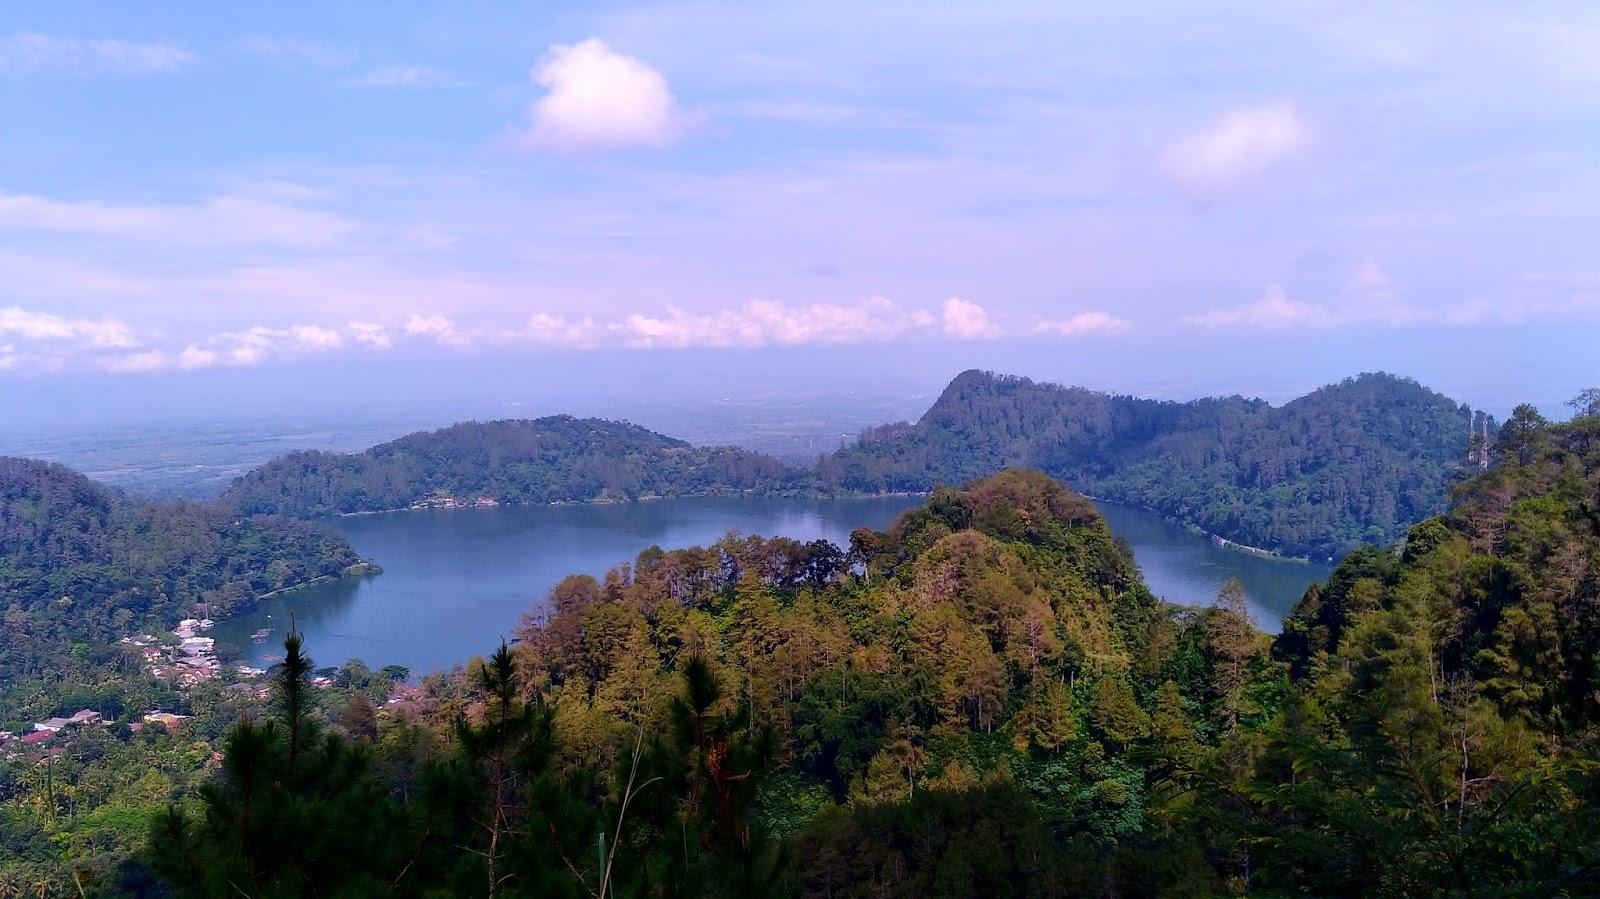 +15 Tempat Wisata Alam Paling Indah Di Jawa Timur